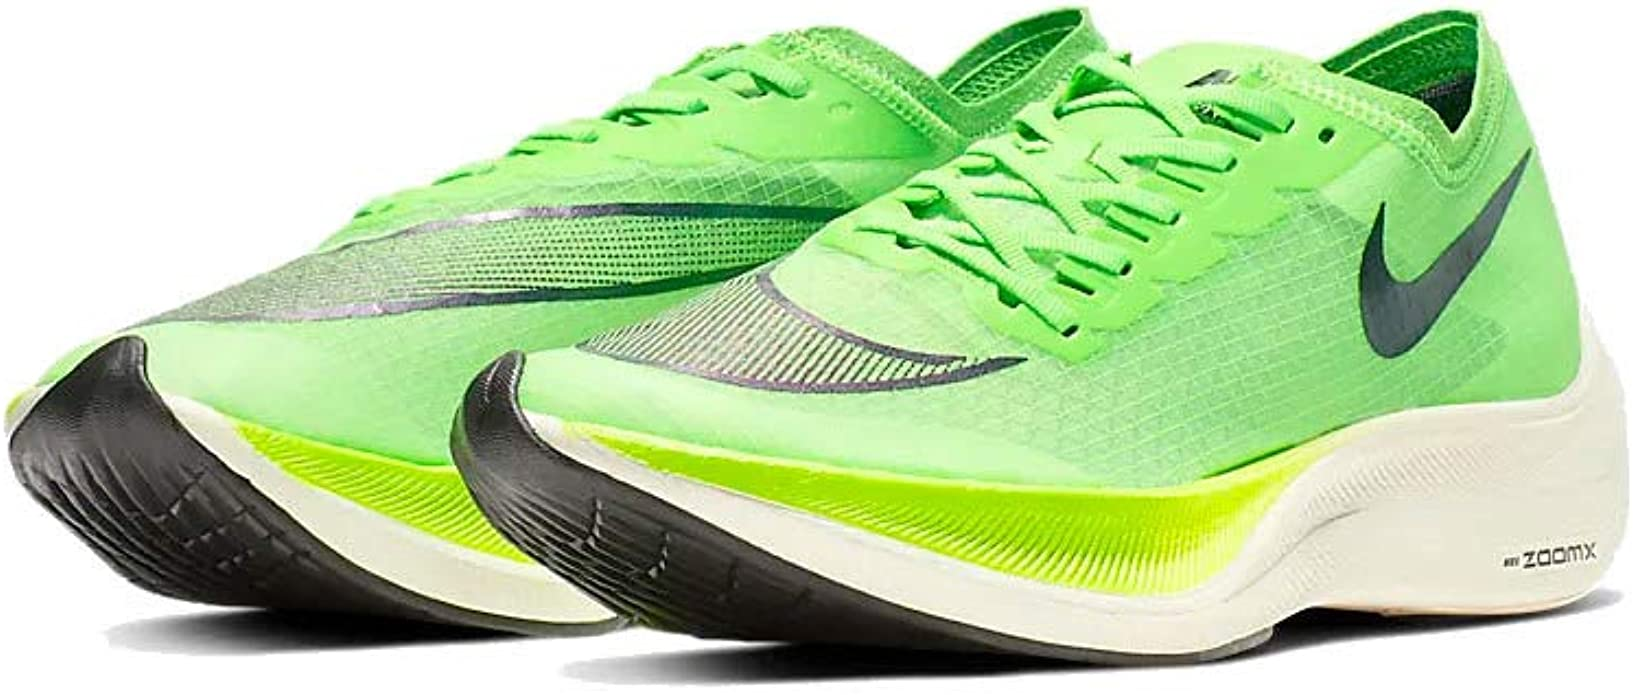 Nike - Zoomx Vaporfly Next - AO4568300